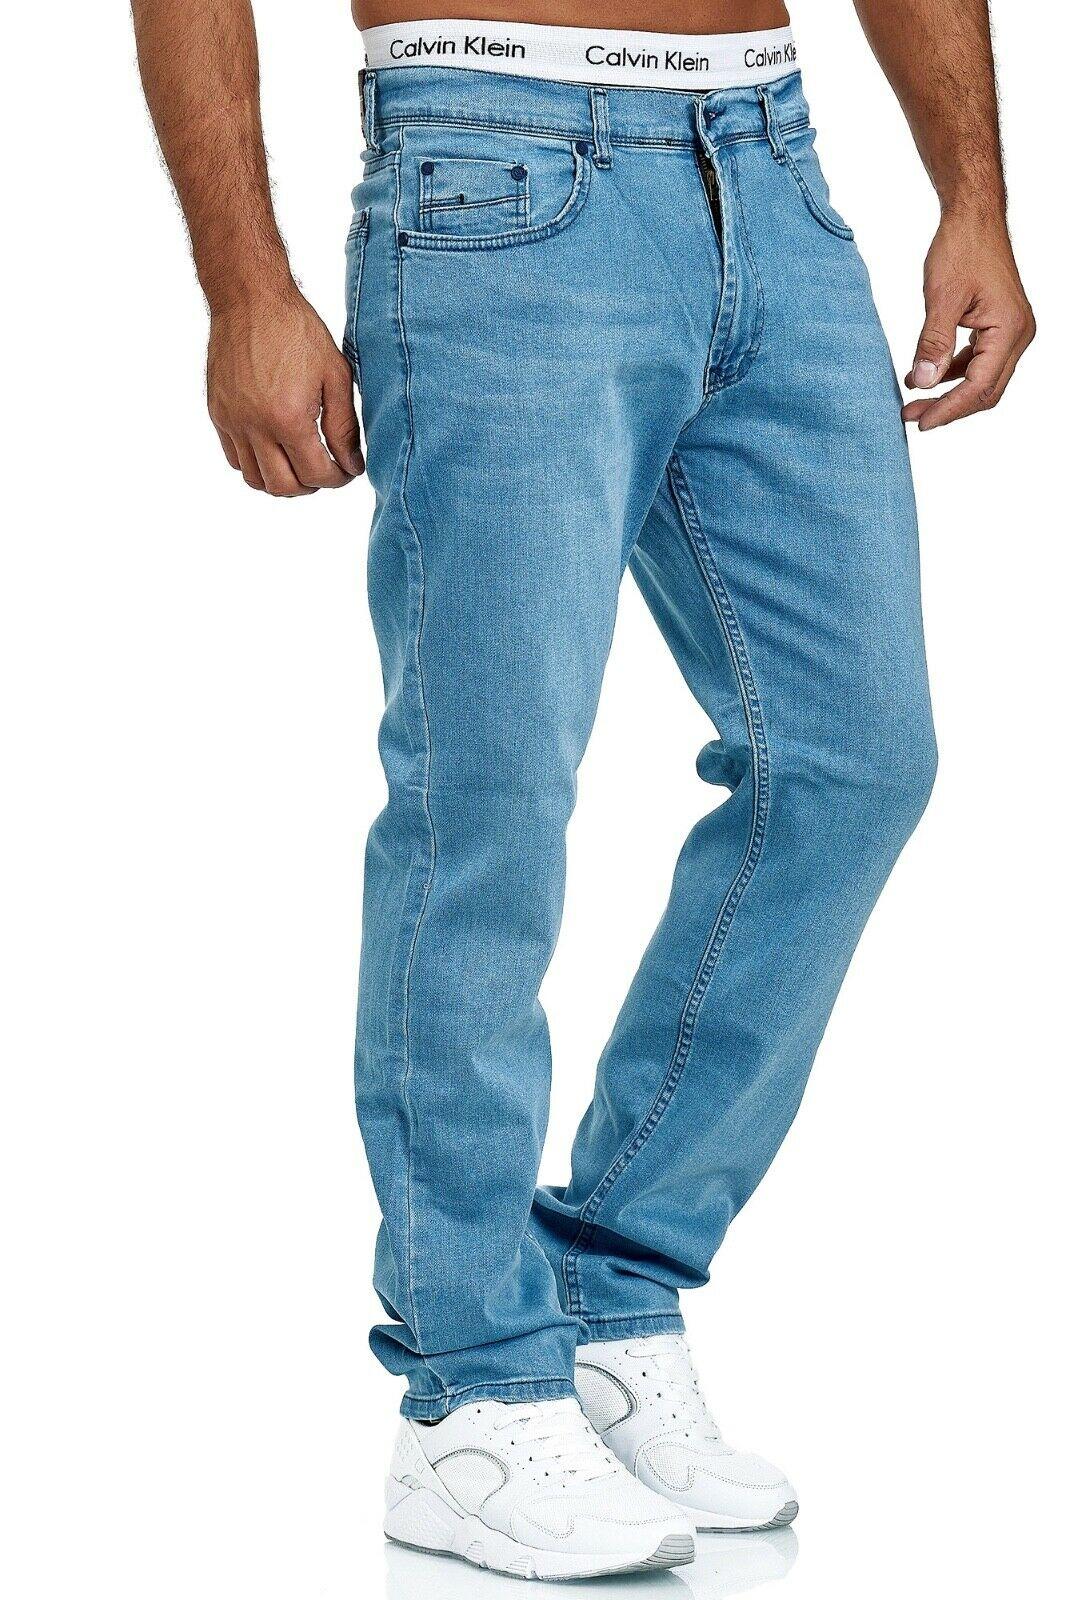 Herren-Jeans-Hose-Denim-KC-Black-Washed-Straight-Cut-Regular-Dicke-Naht-naehte Indexbild 73